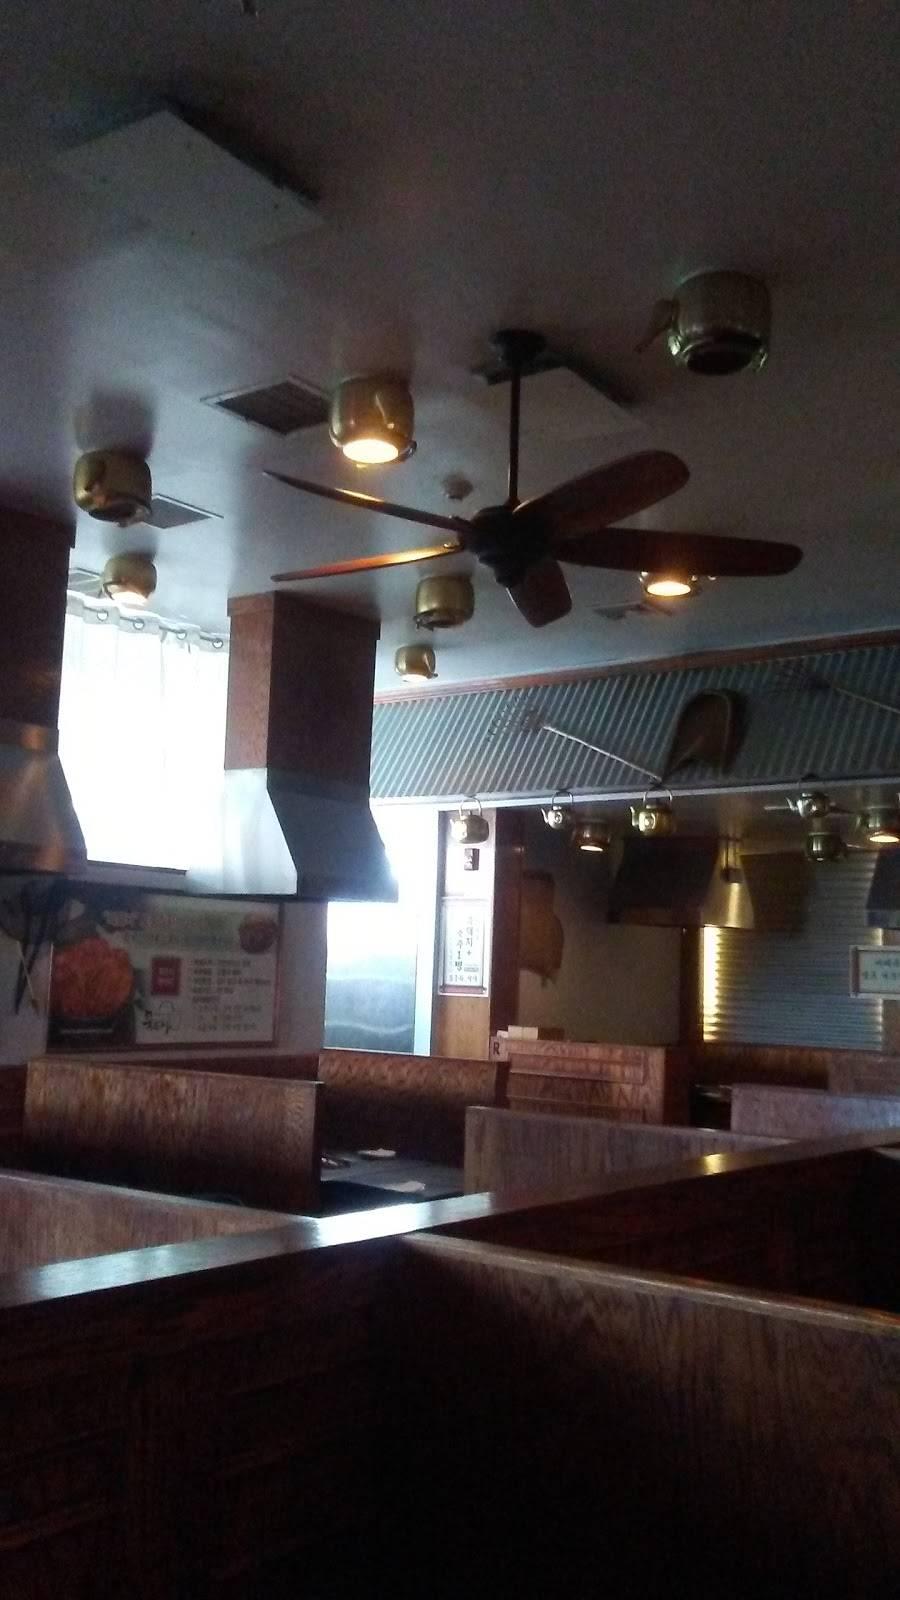 Mukeunji 묵은지 | restaurant | 217 Broad Ave, Palisades Park, NJ 07650, USA | 2013630600 OR +1 201-363-0600